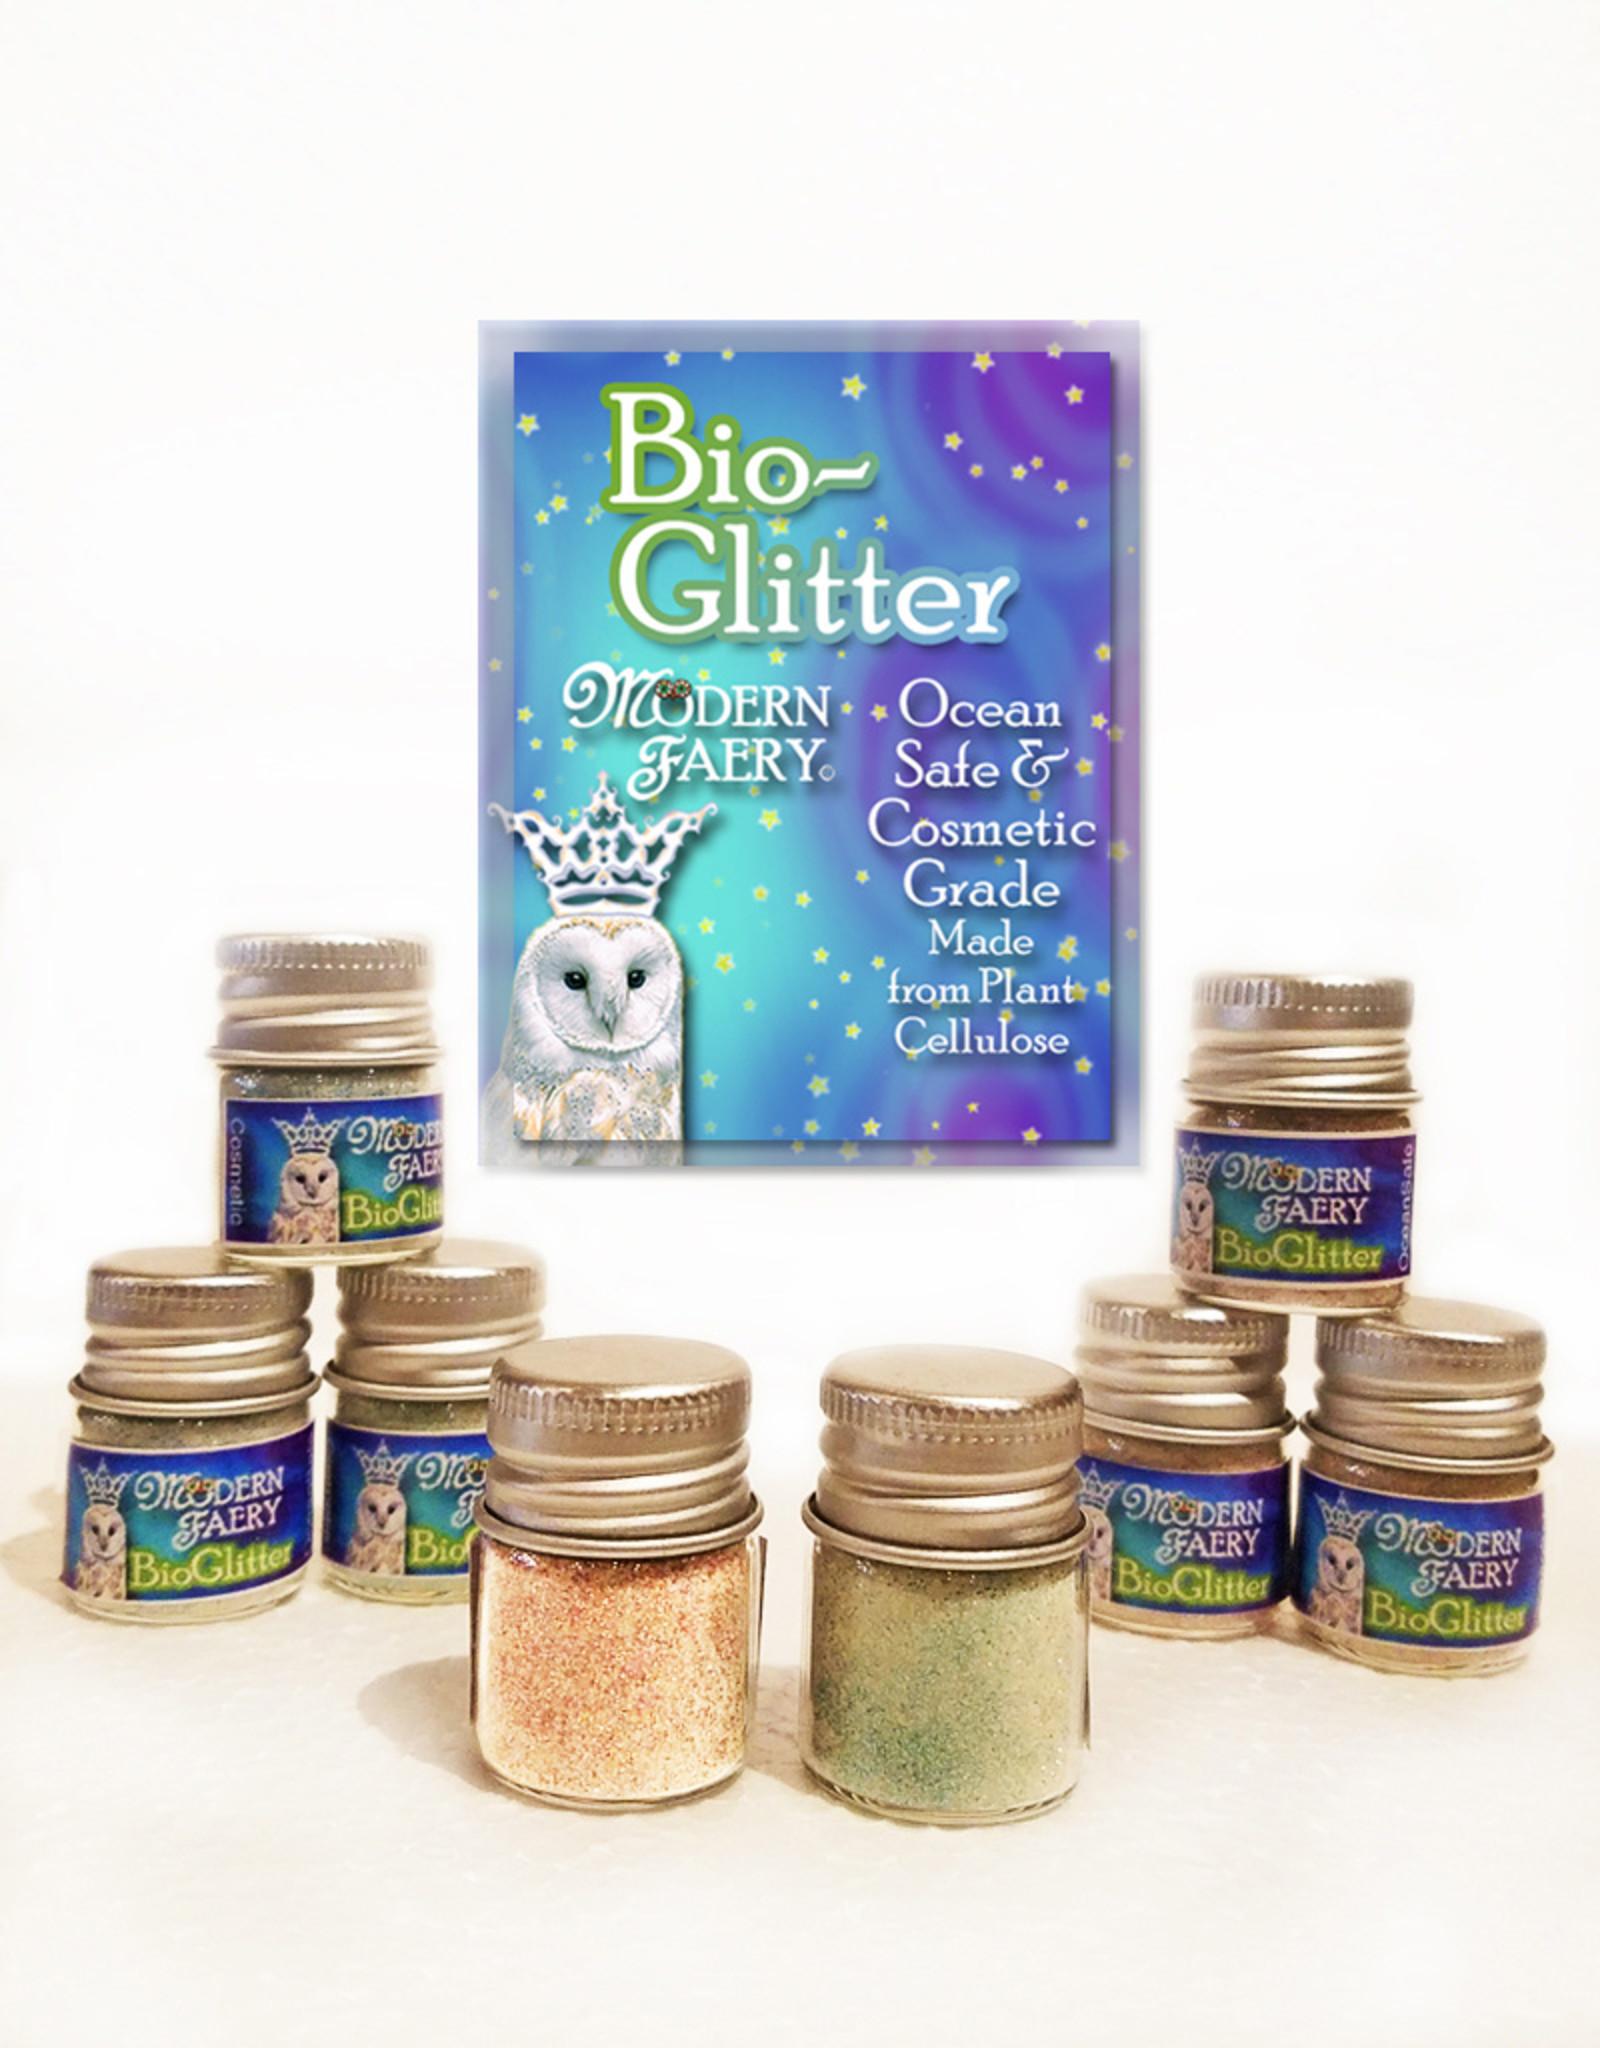 LadyJane Studios ModernFaery Cosmetic Biodegradable Glitter, Ocean Safe